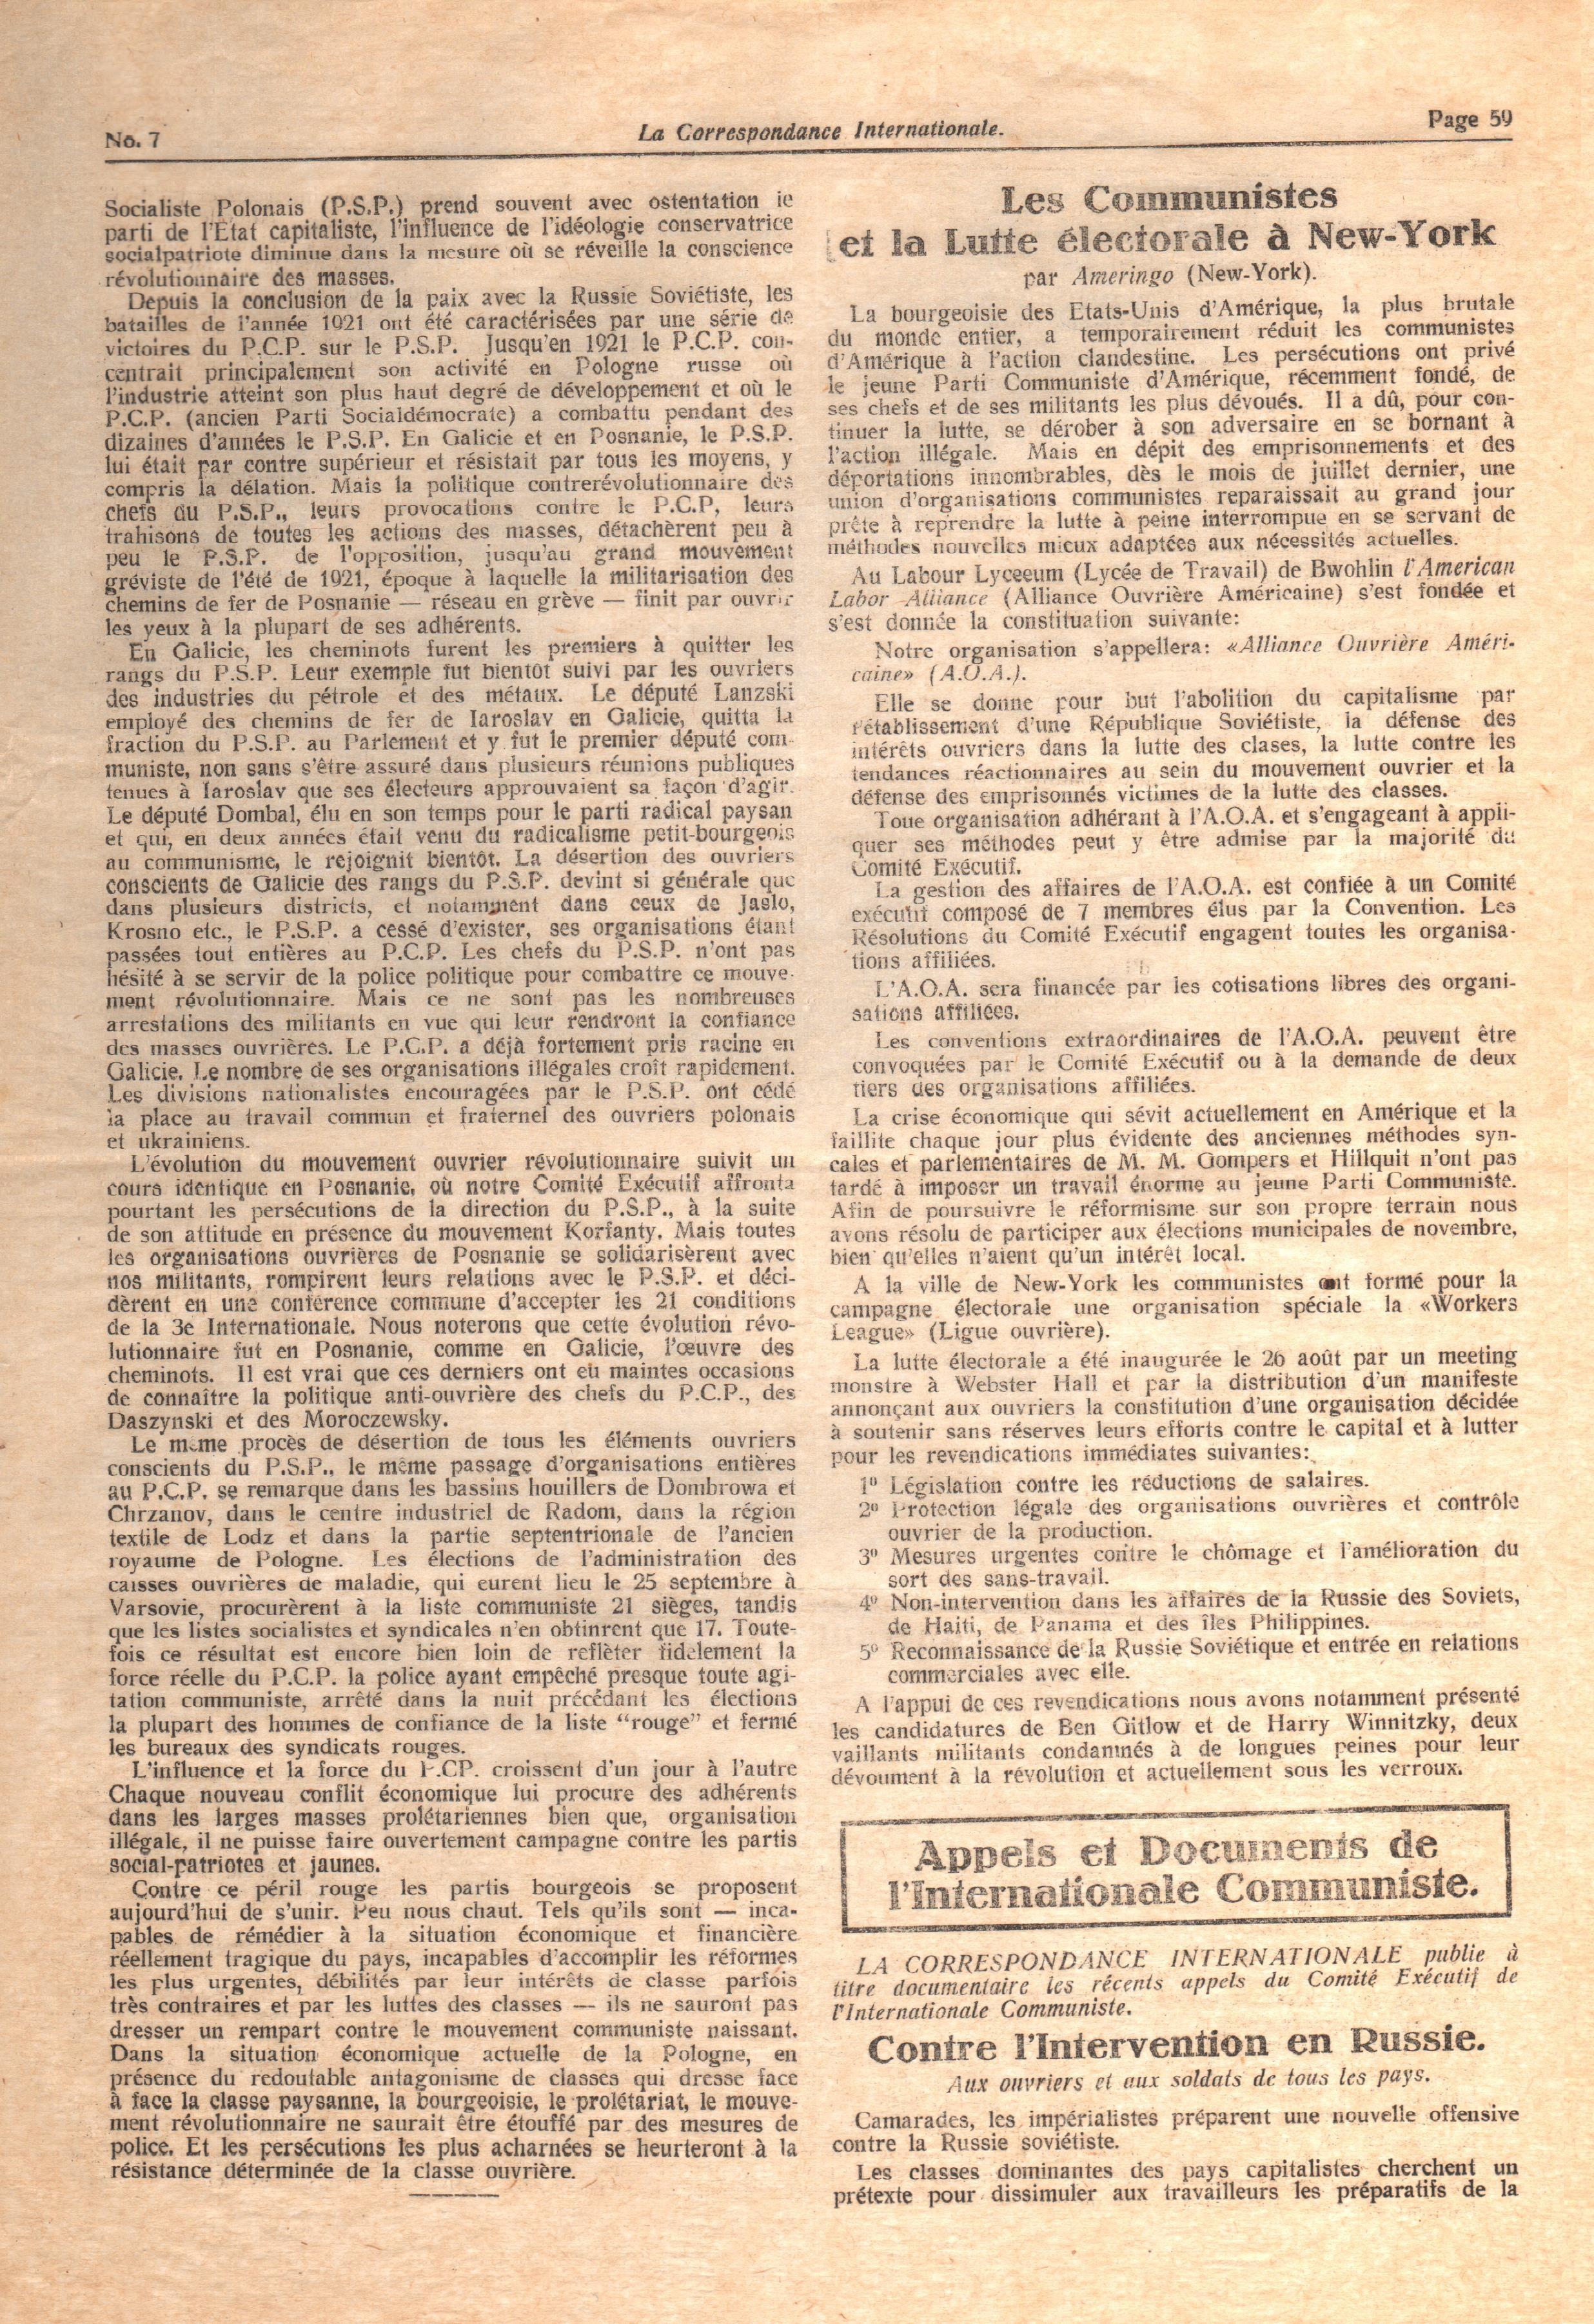 La Correspondance Internationale 7 - pag. 07